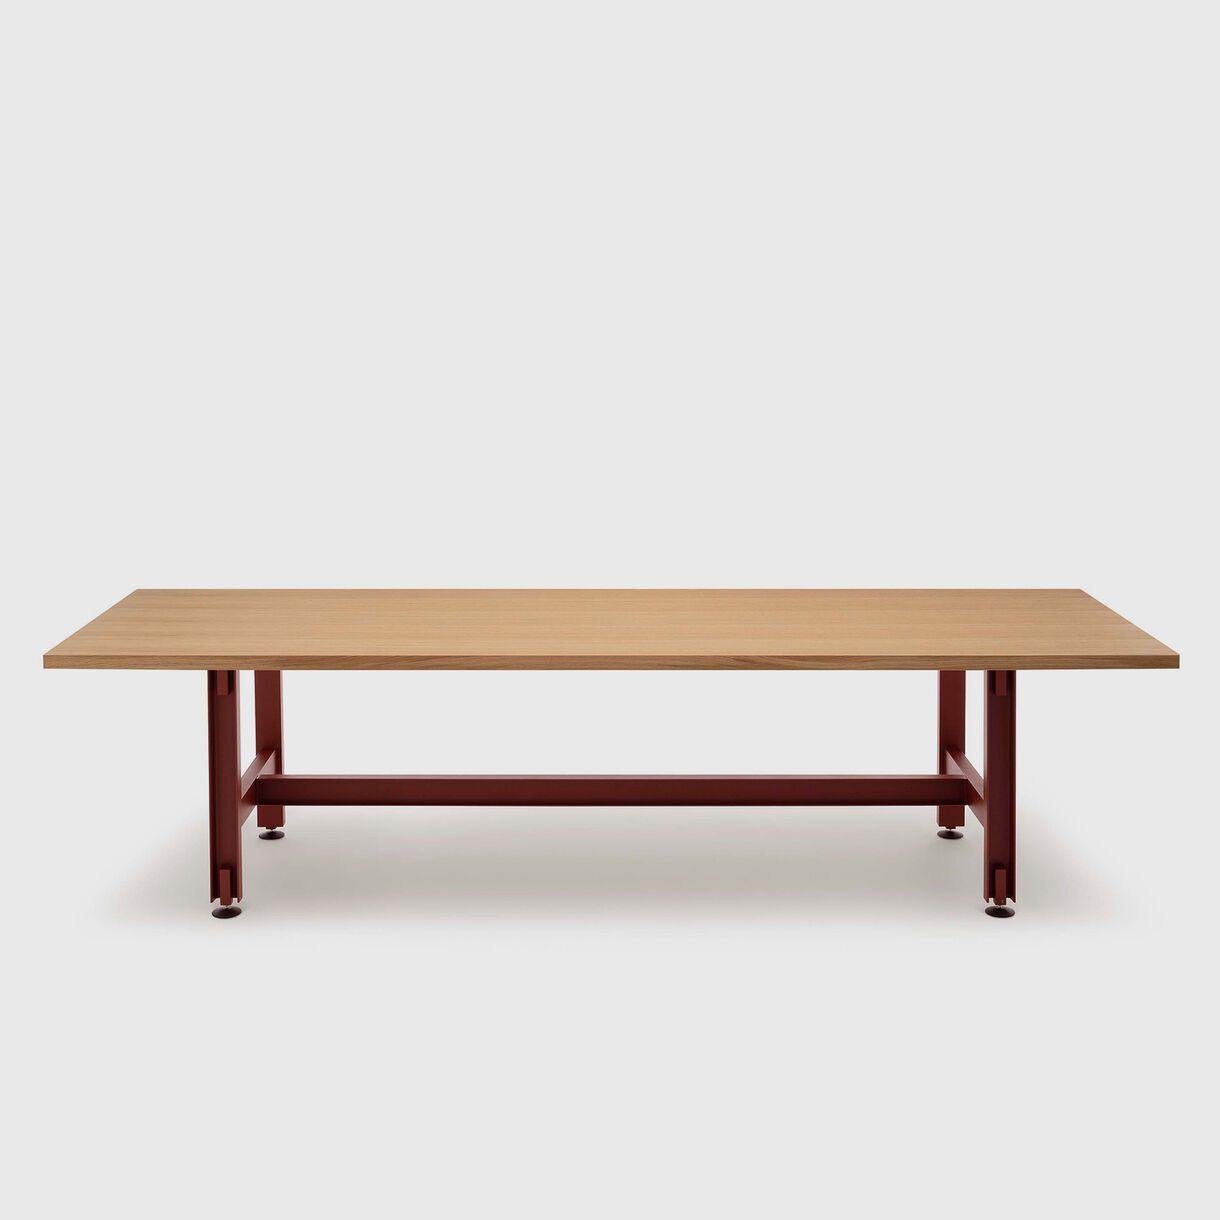 Beam Table